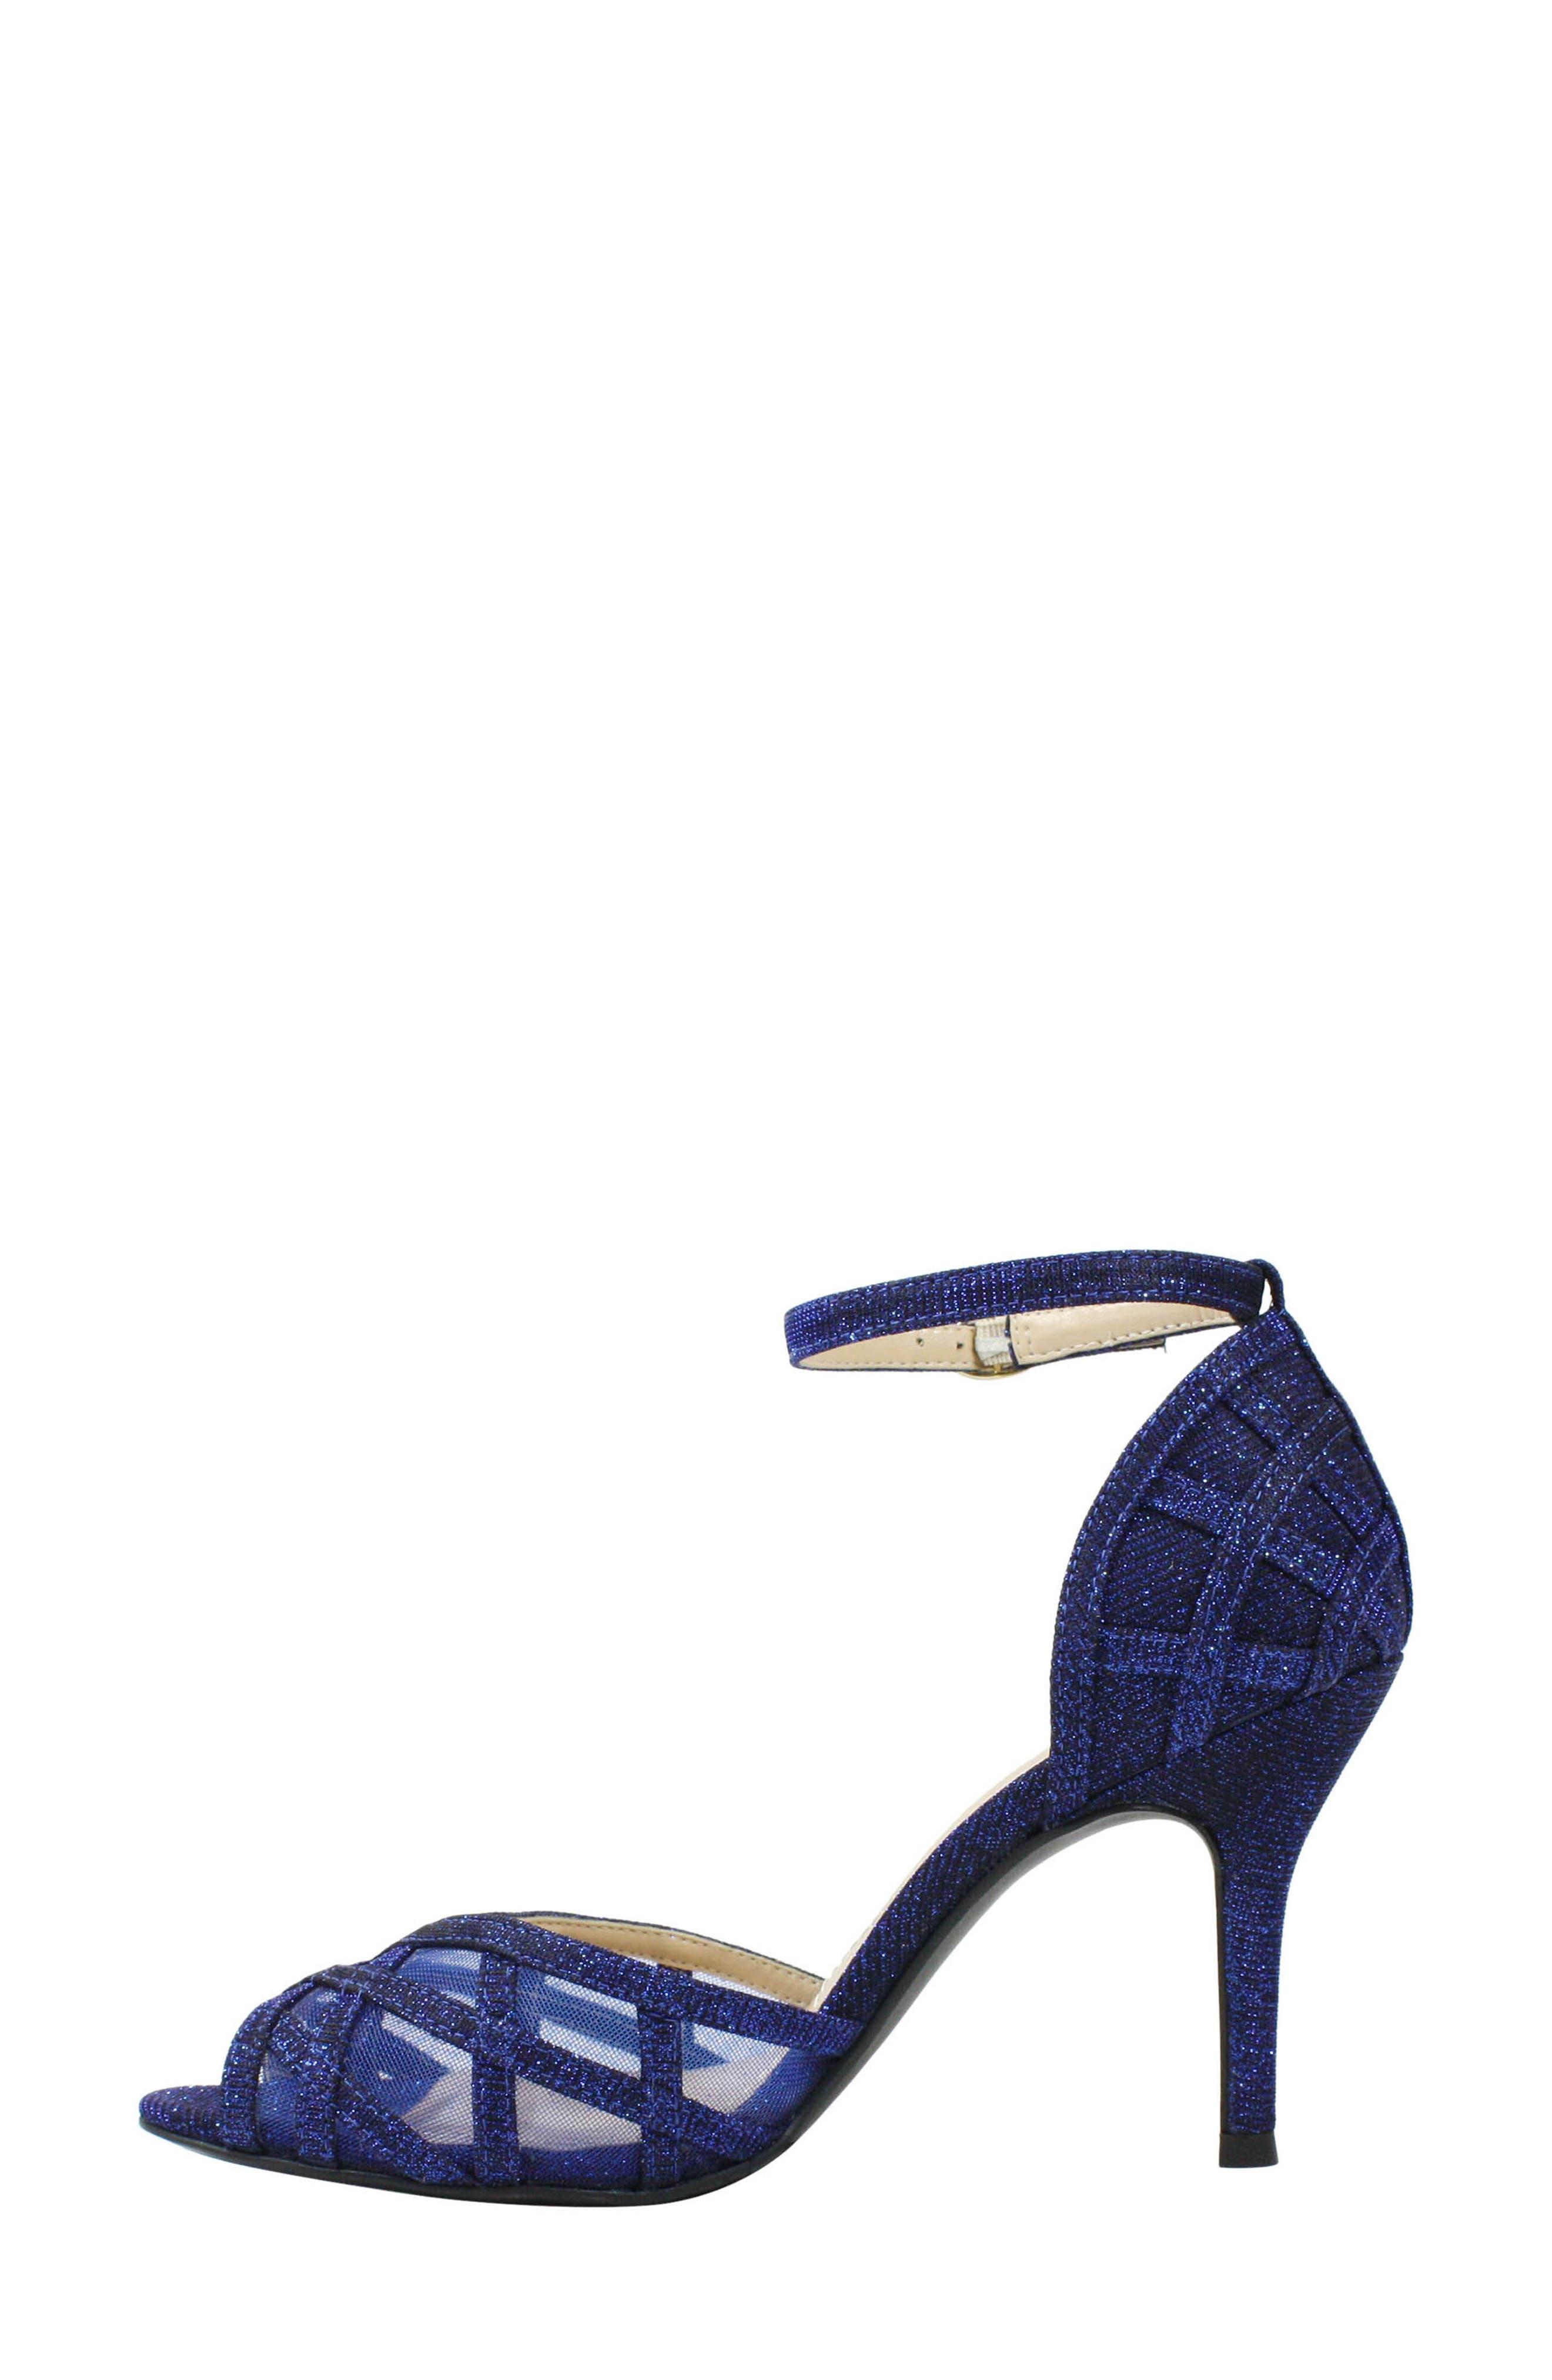 Alternate Image 2  - J. Reneé Mataro Embellished Ankle Strap Pump (Women)